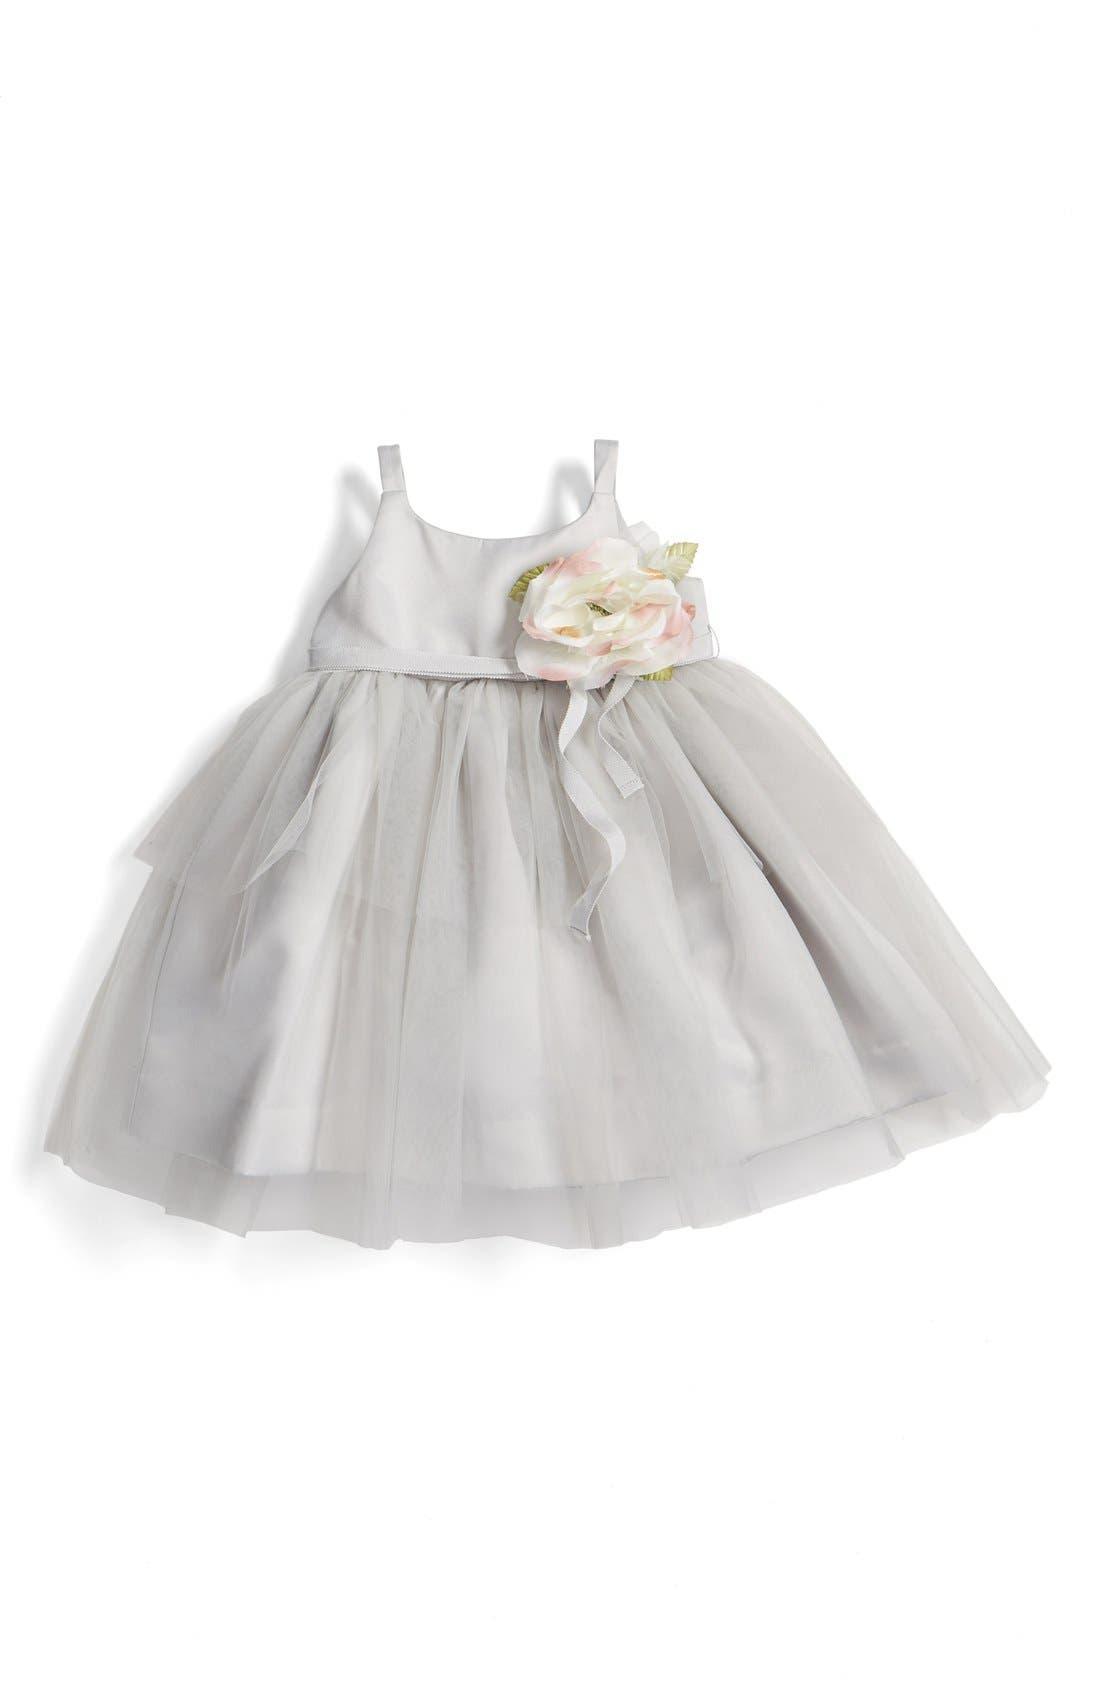 Tulle Ballerina Dress,                         Main,                         color, Silver